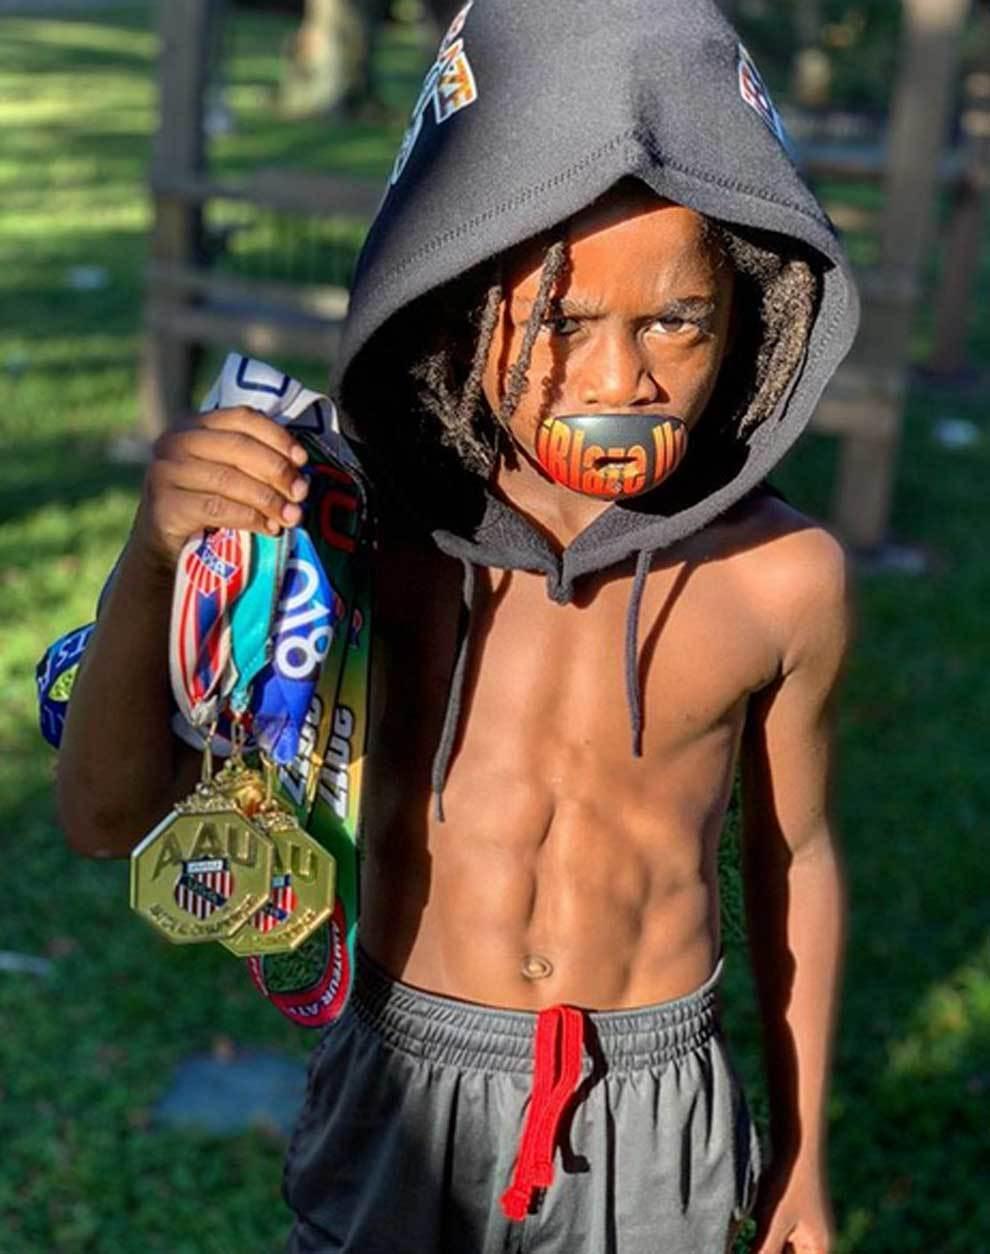 Niño de 7 años se acerca al récord mundial de Usain Bolt